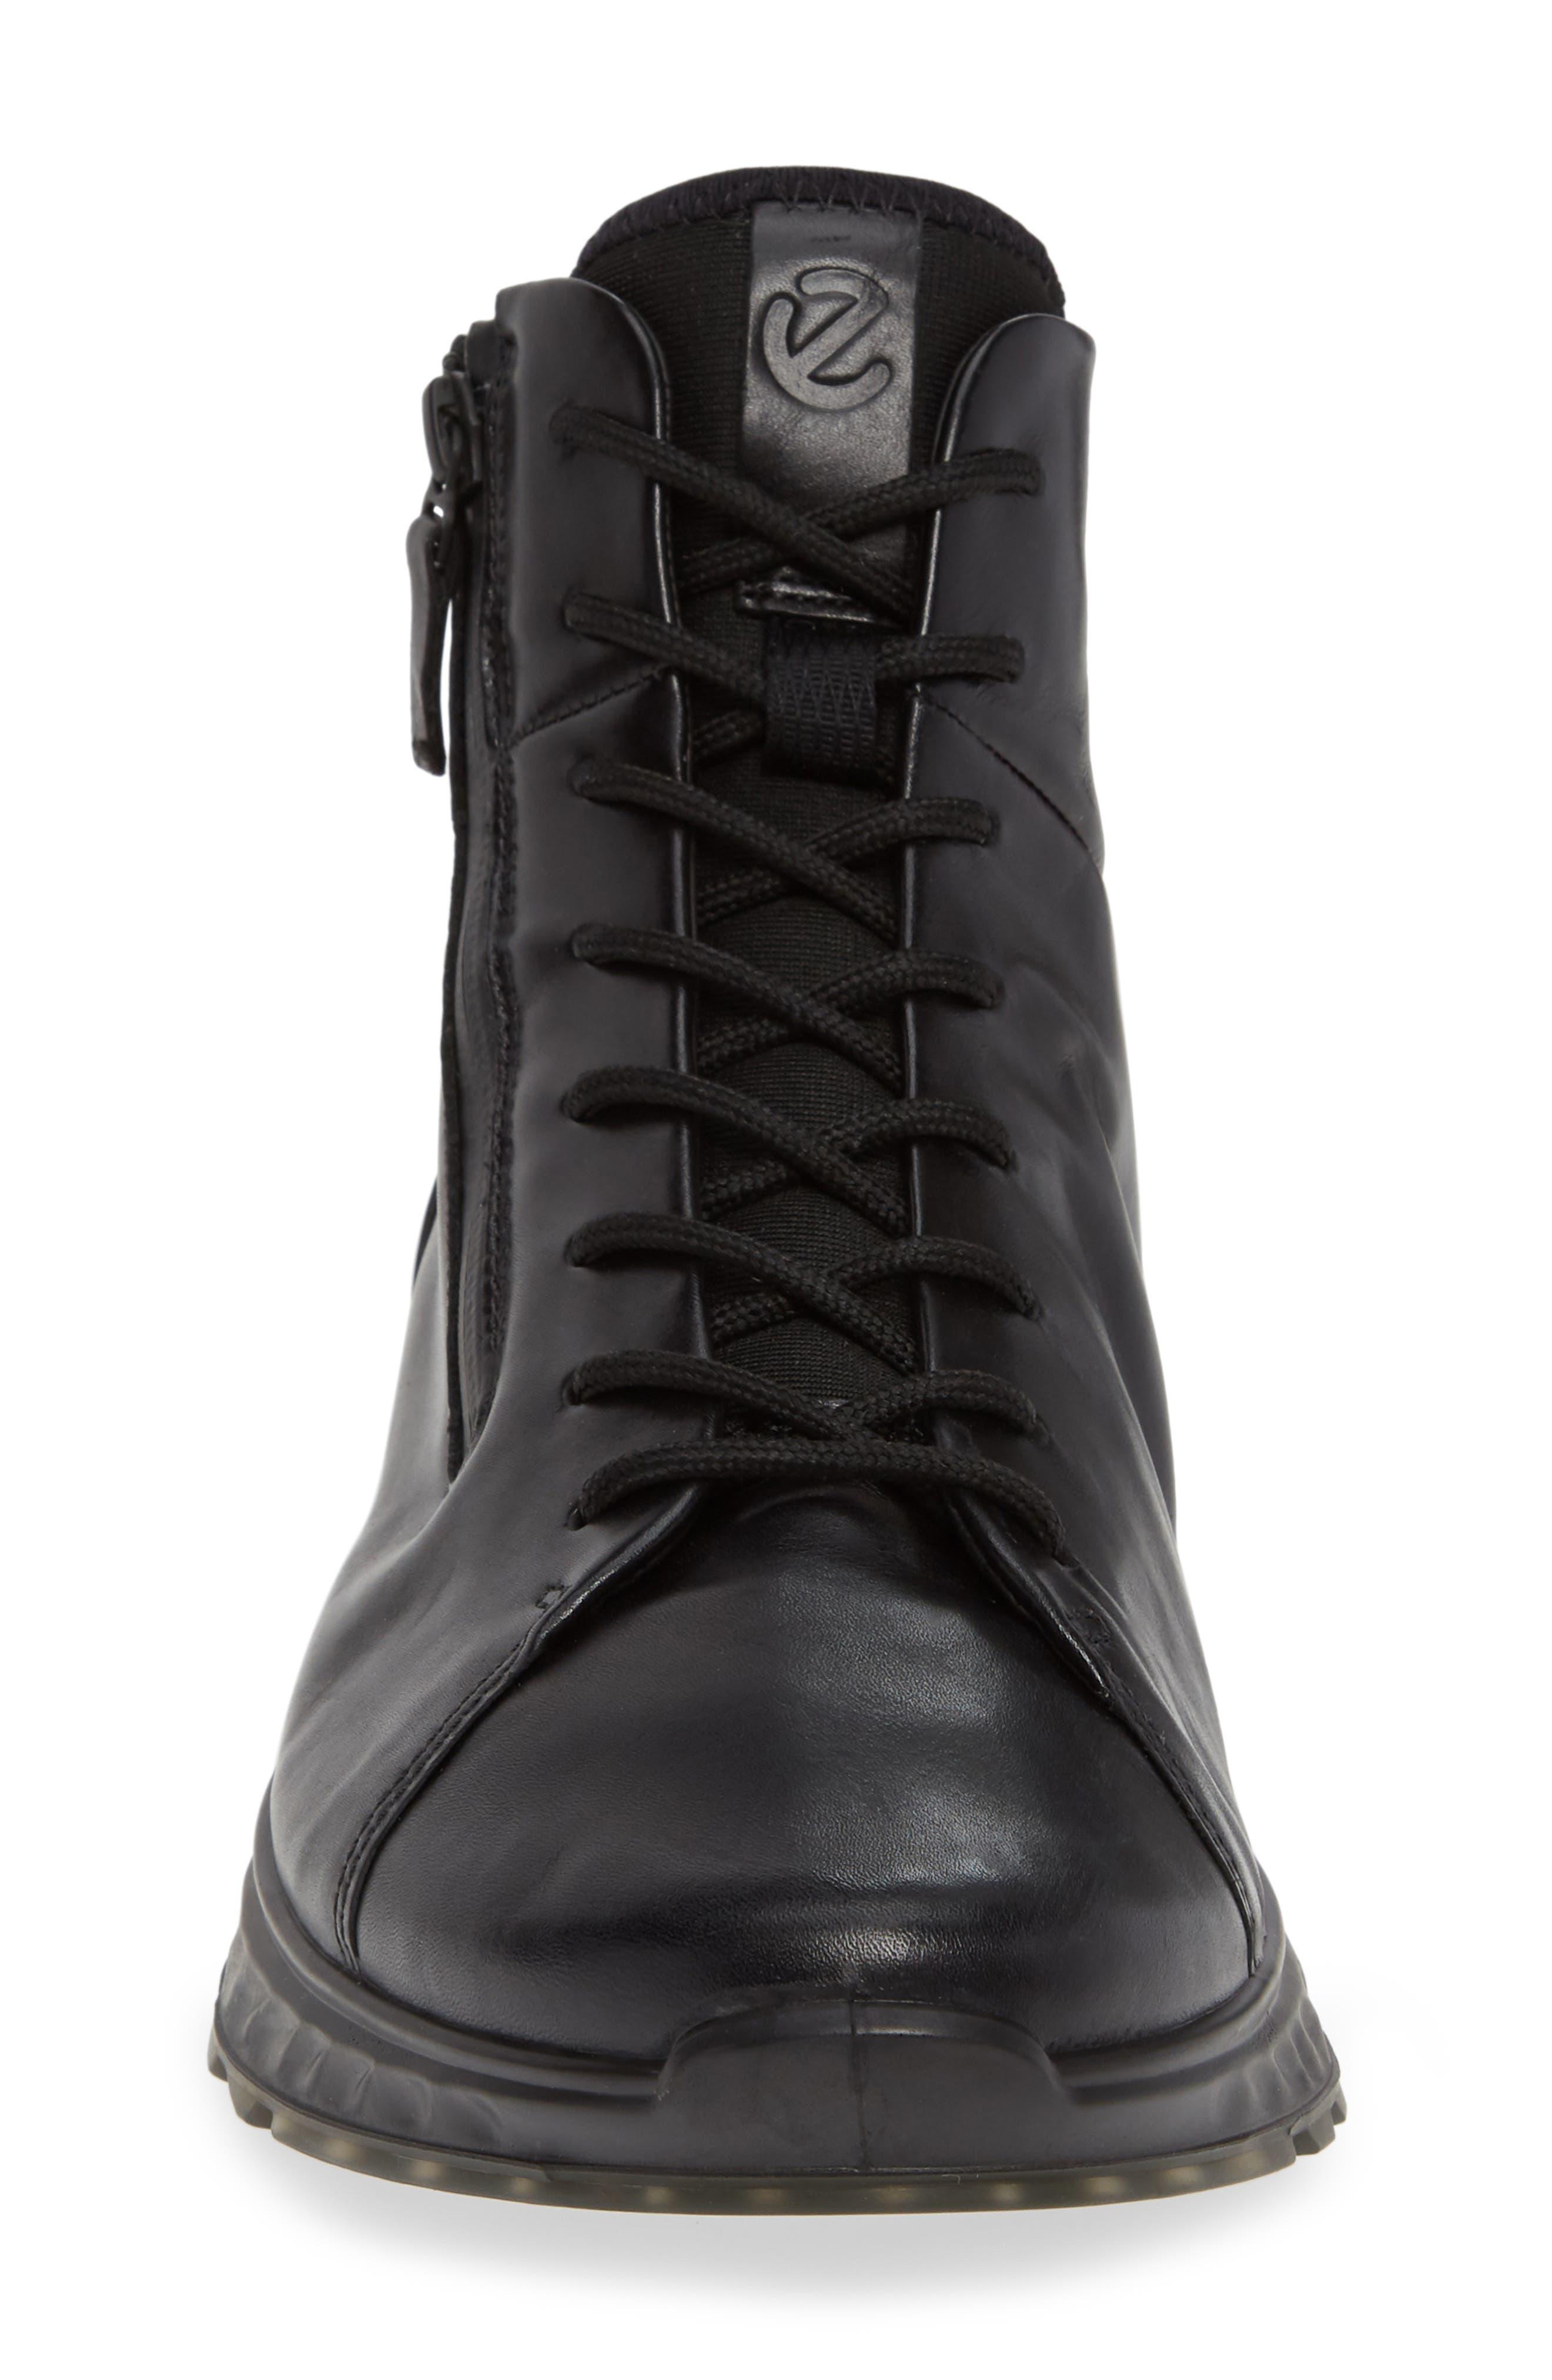 ST1 High Top Sneaker,                             Alternate thumbnail 4, color,                             BLACK/BLACK LEATHER